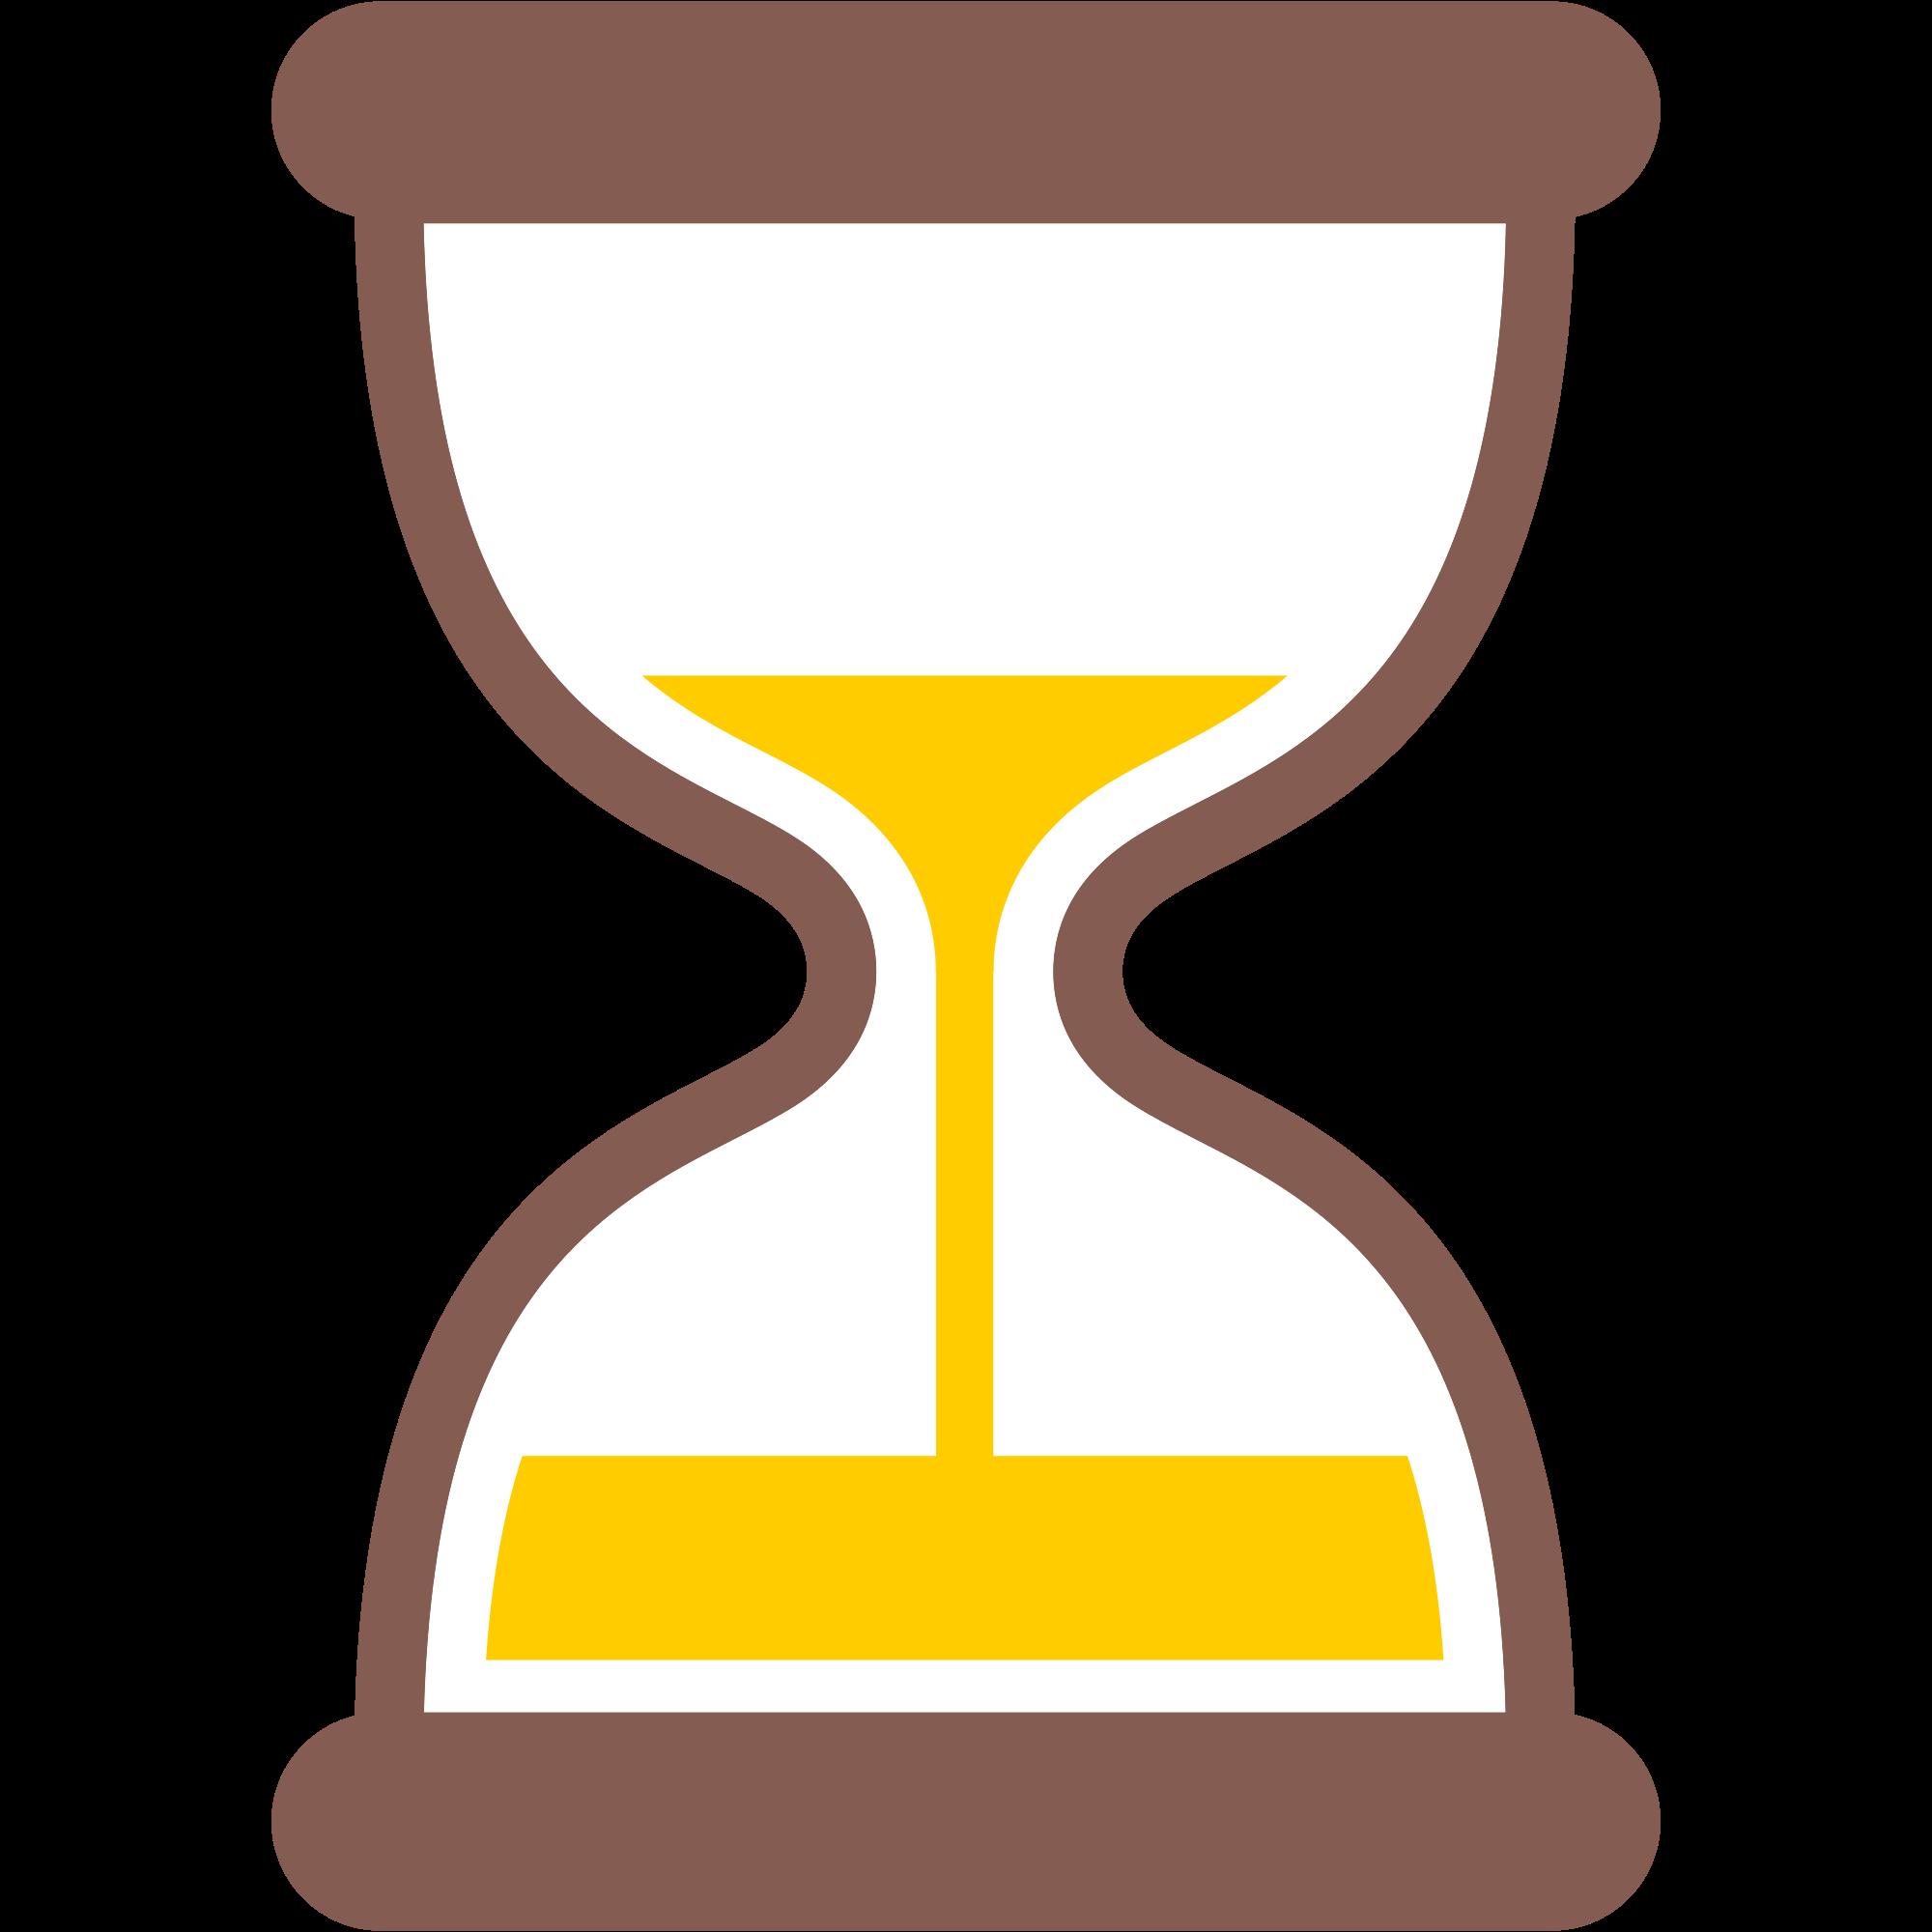 File emoji u f. Hourglass clipart yellow